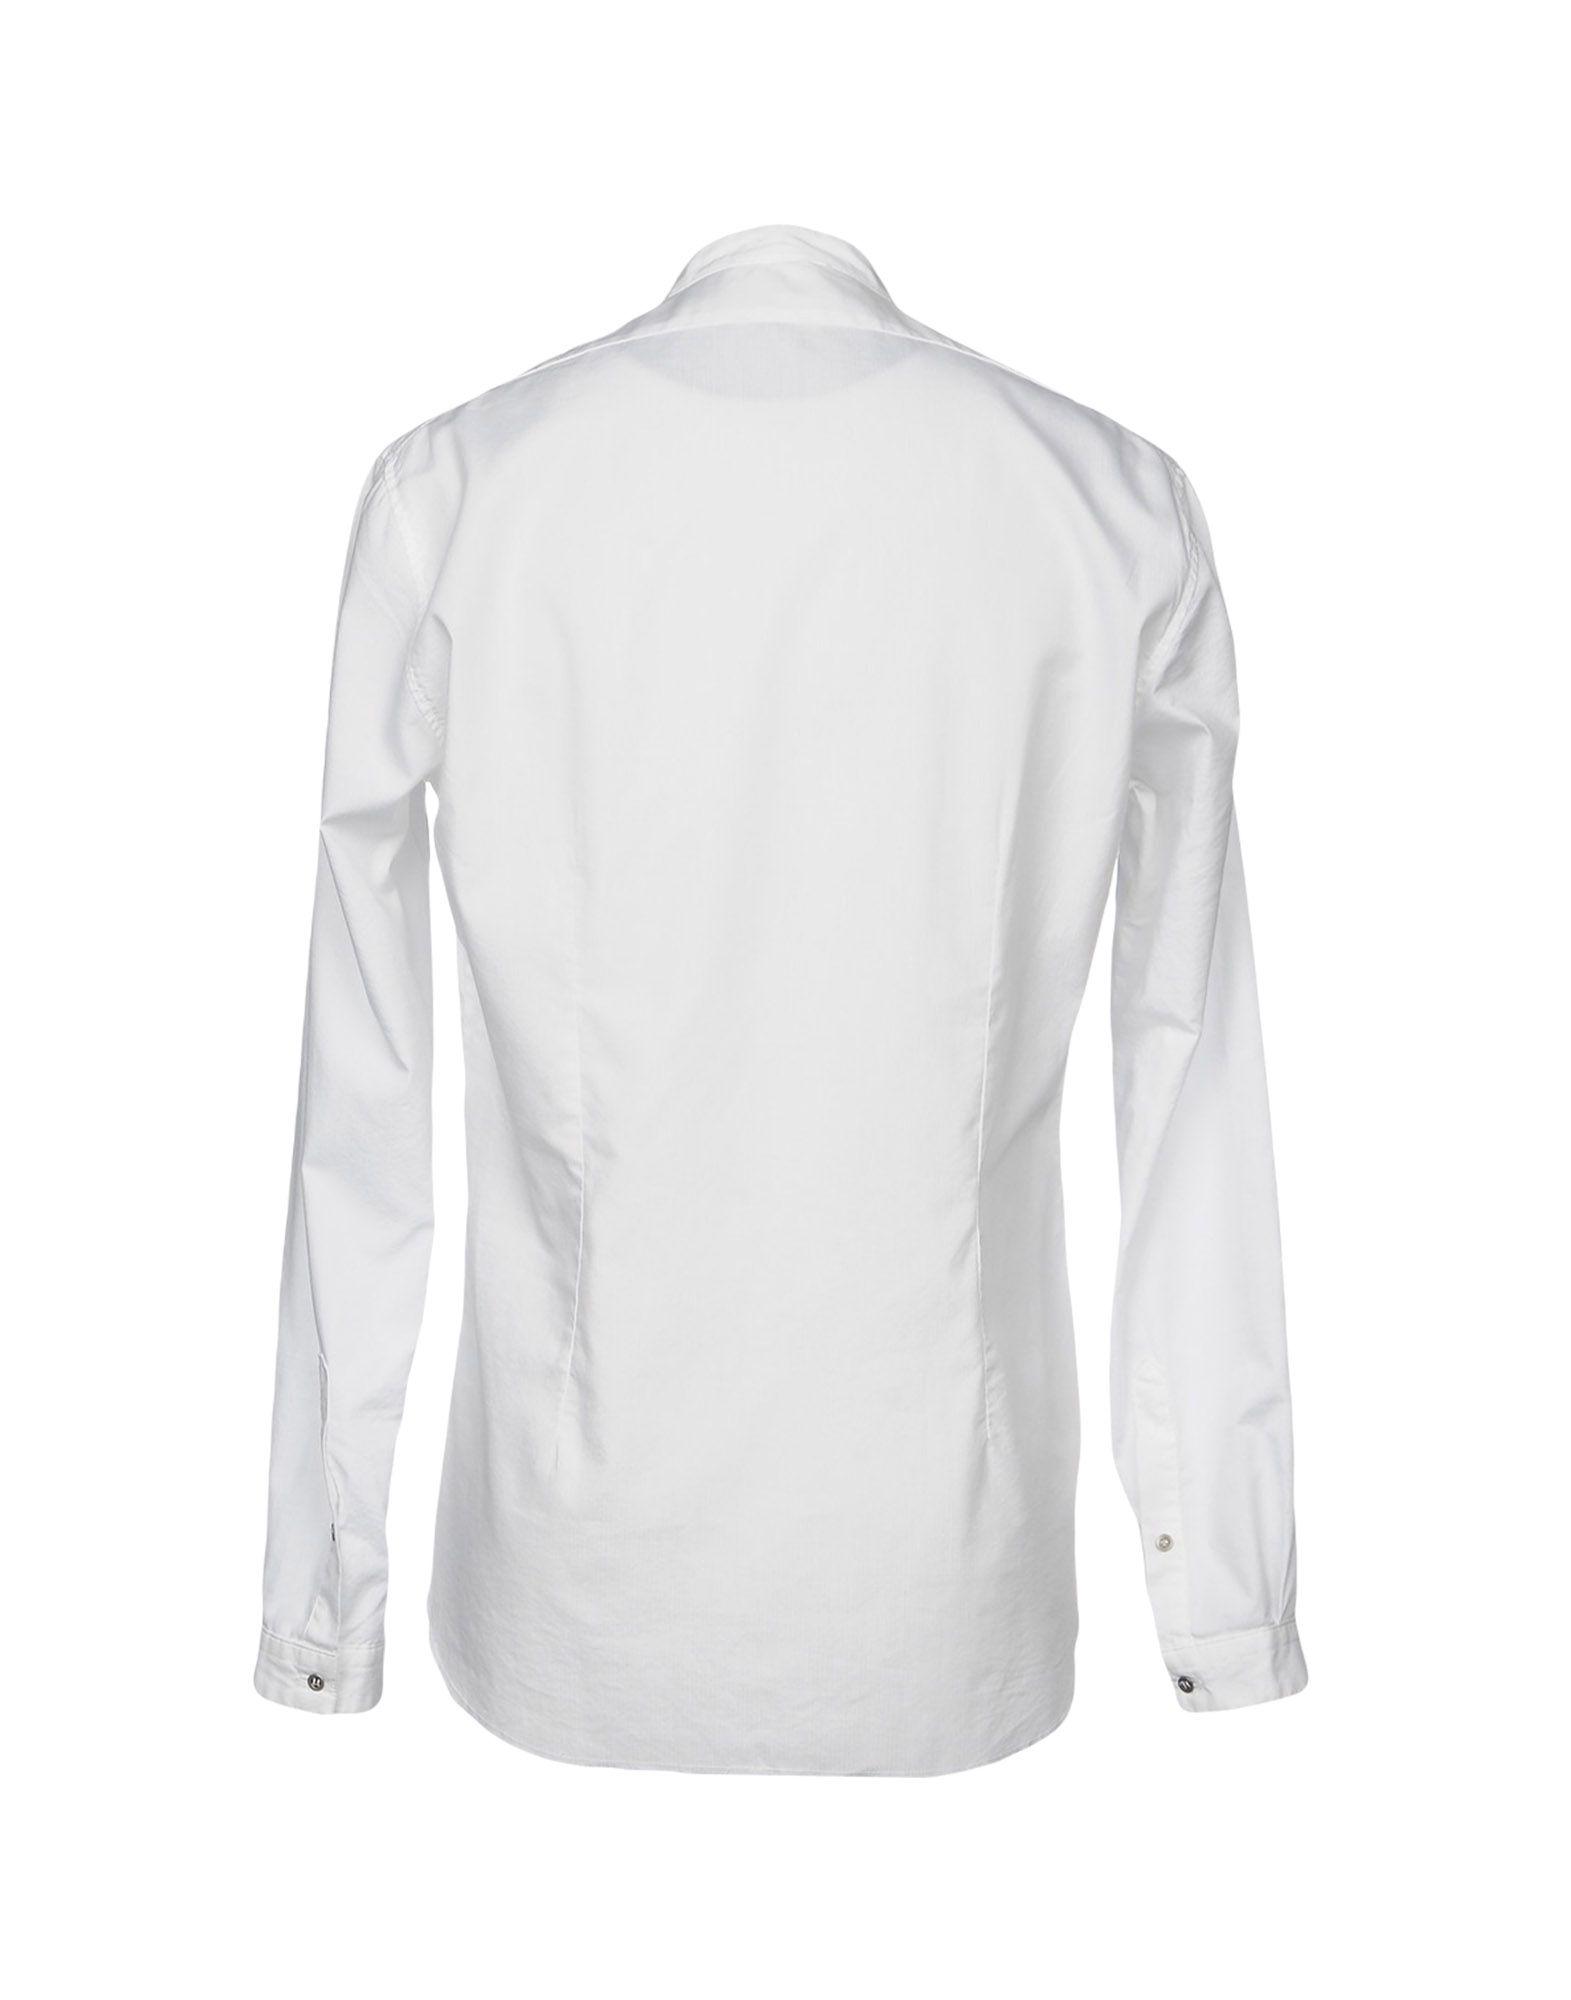 Camicia Tinta Unita Illogico Uomo Uomo Uomo - 38692871RL c4b770